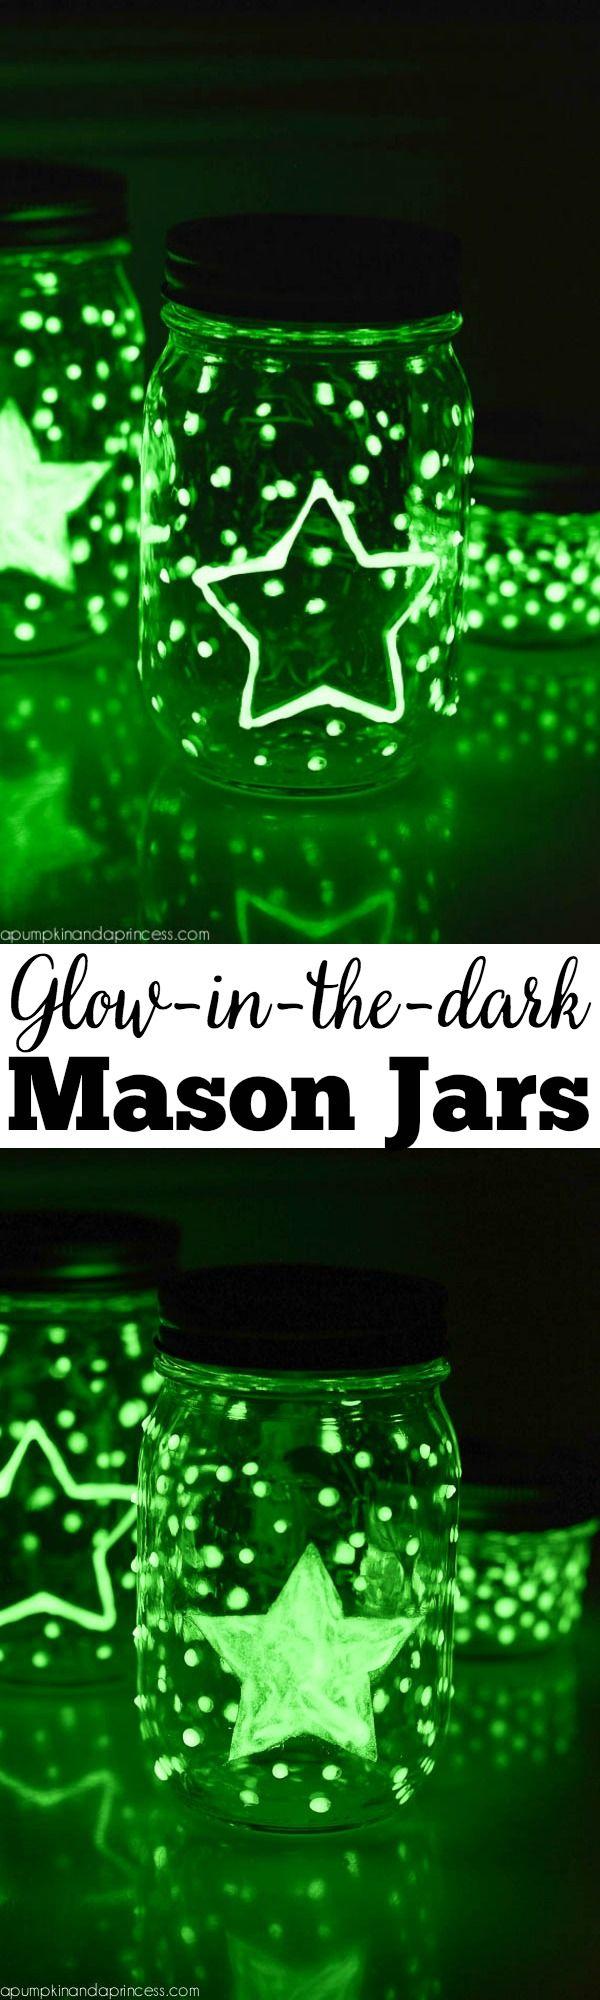 Glow-in-the-dark Mason Jars